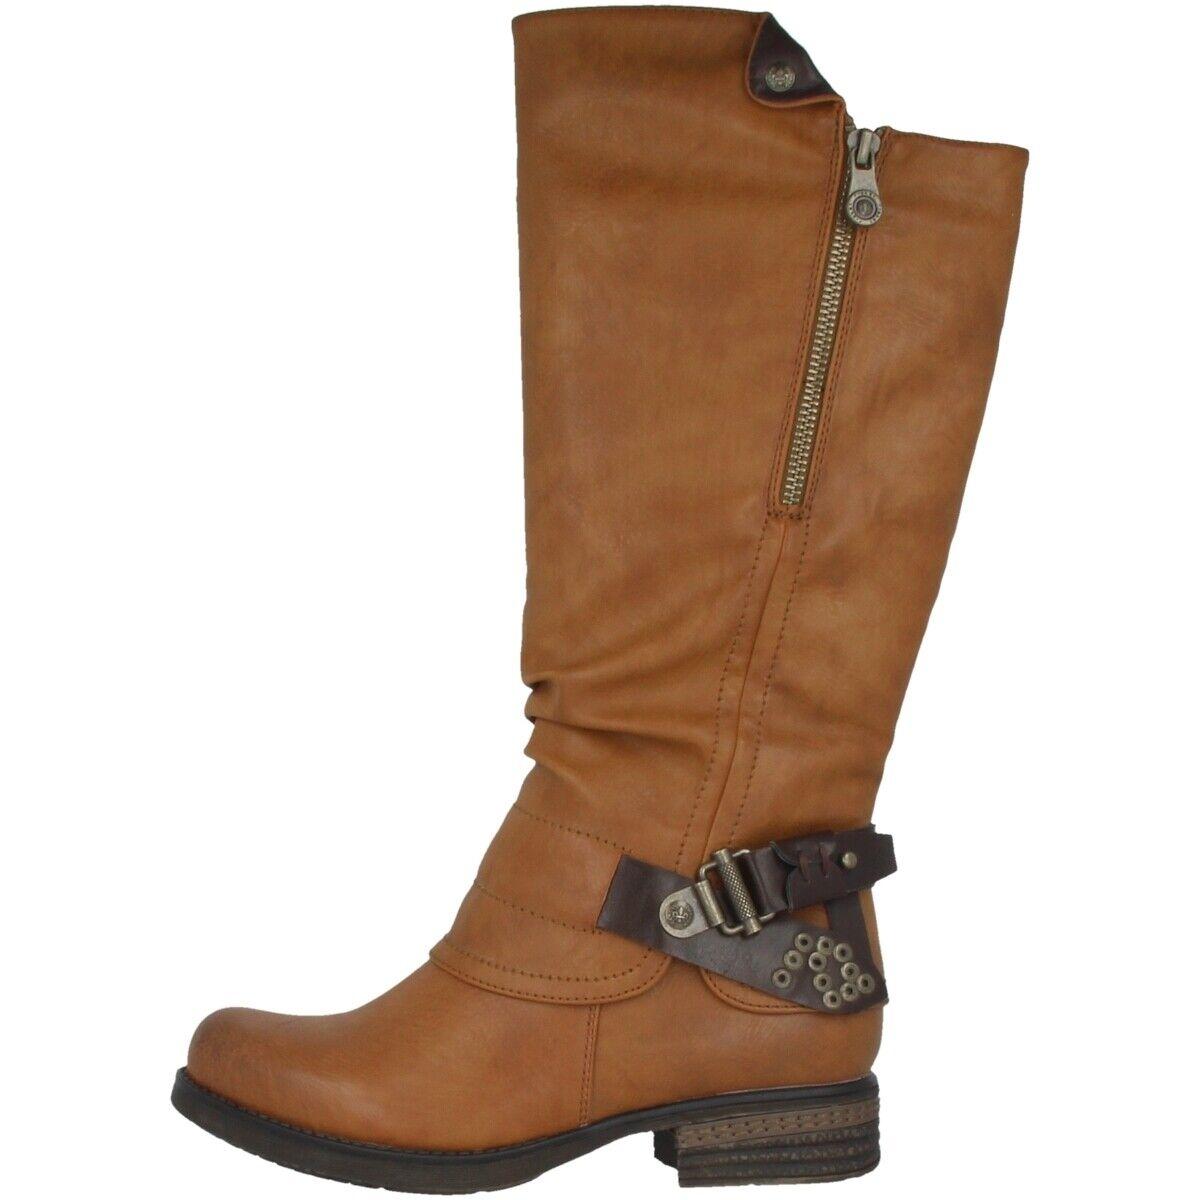 Rieker Eagle-Richmond Stiefel Antistress Damen Schuhe Winterstiefel 93271-24